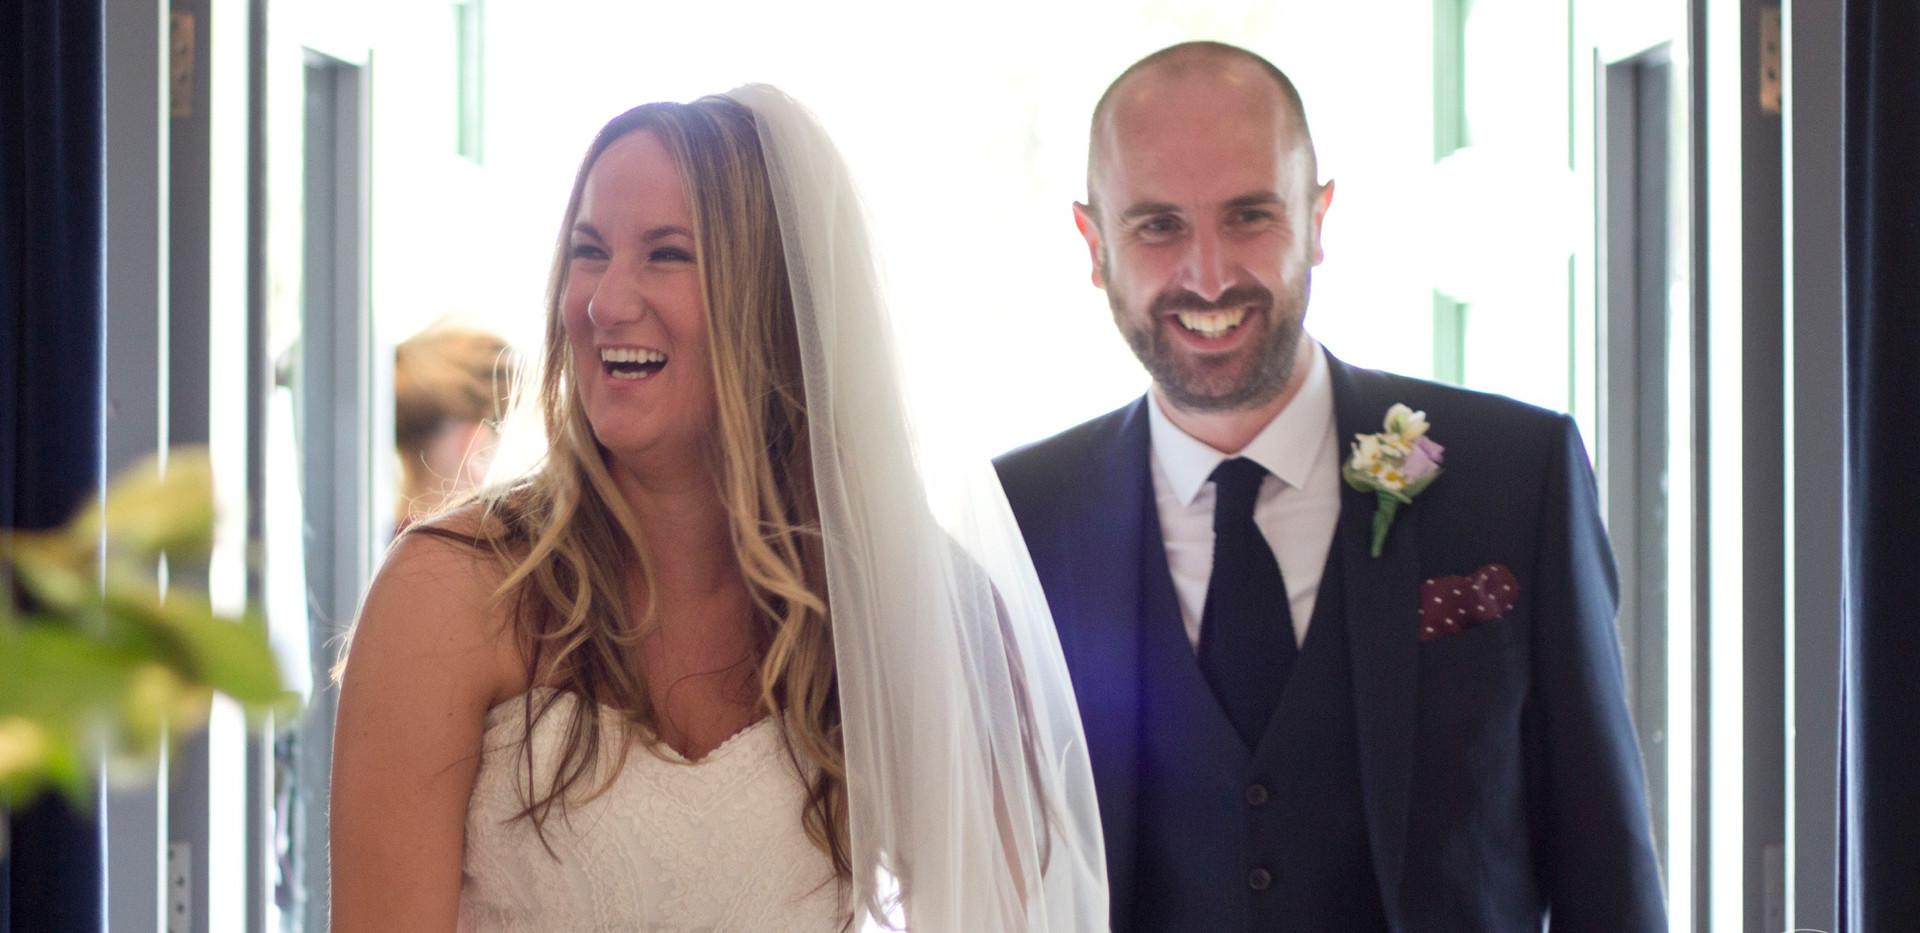 60 hope stree wedding